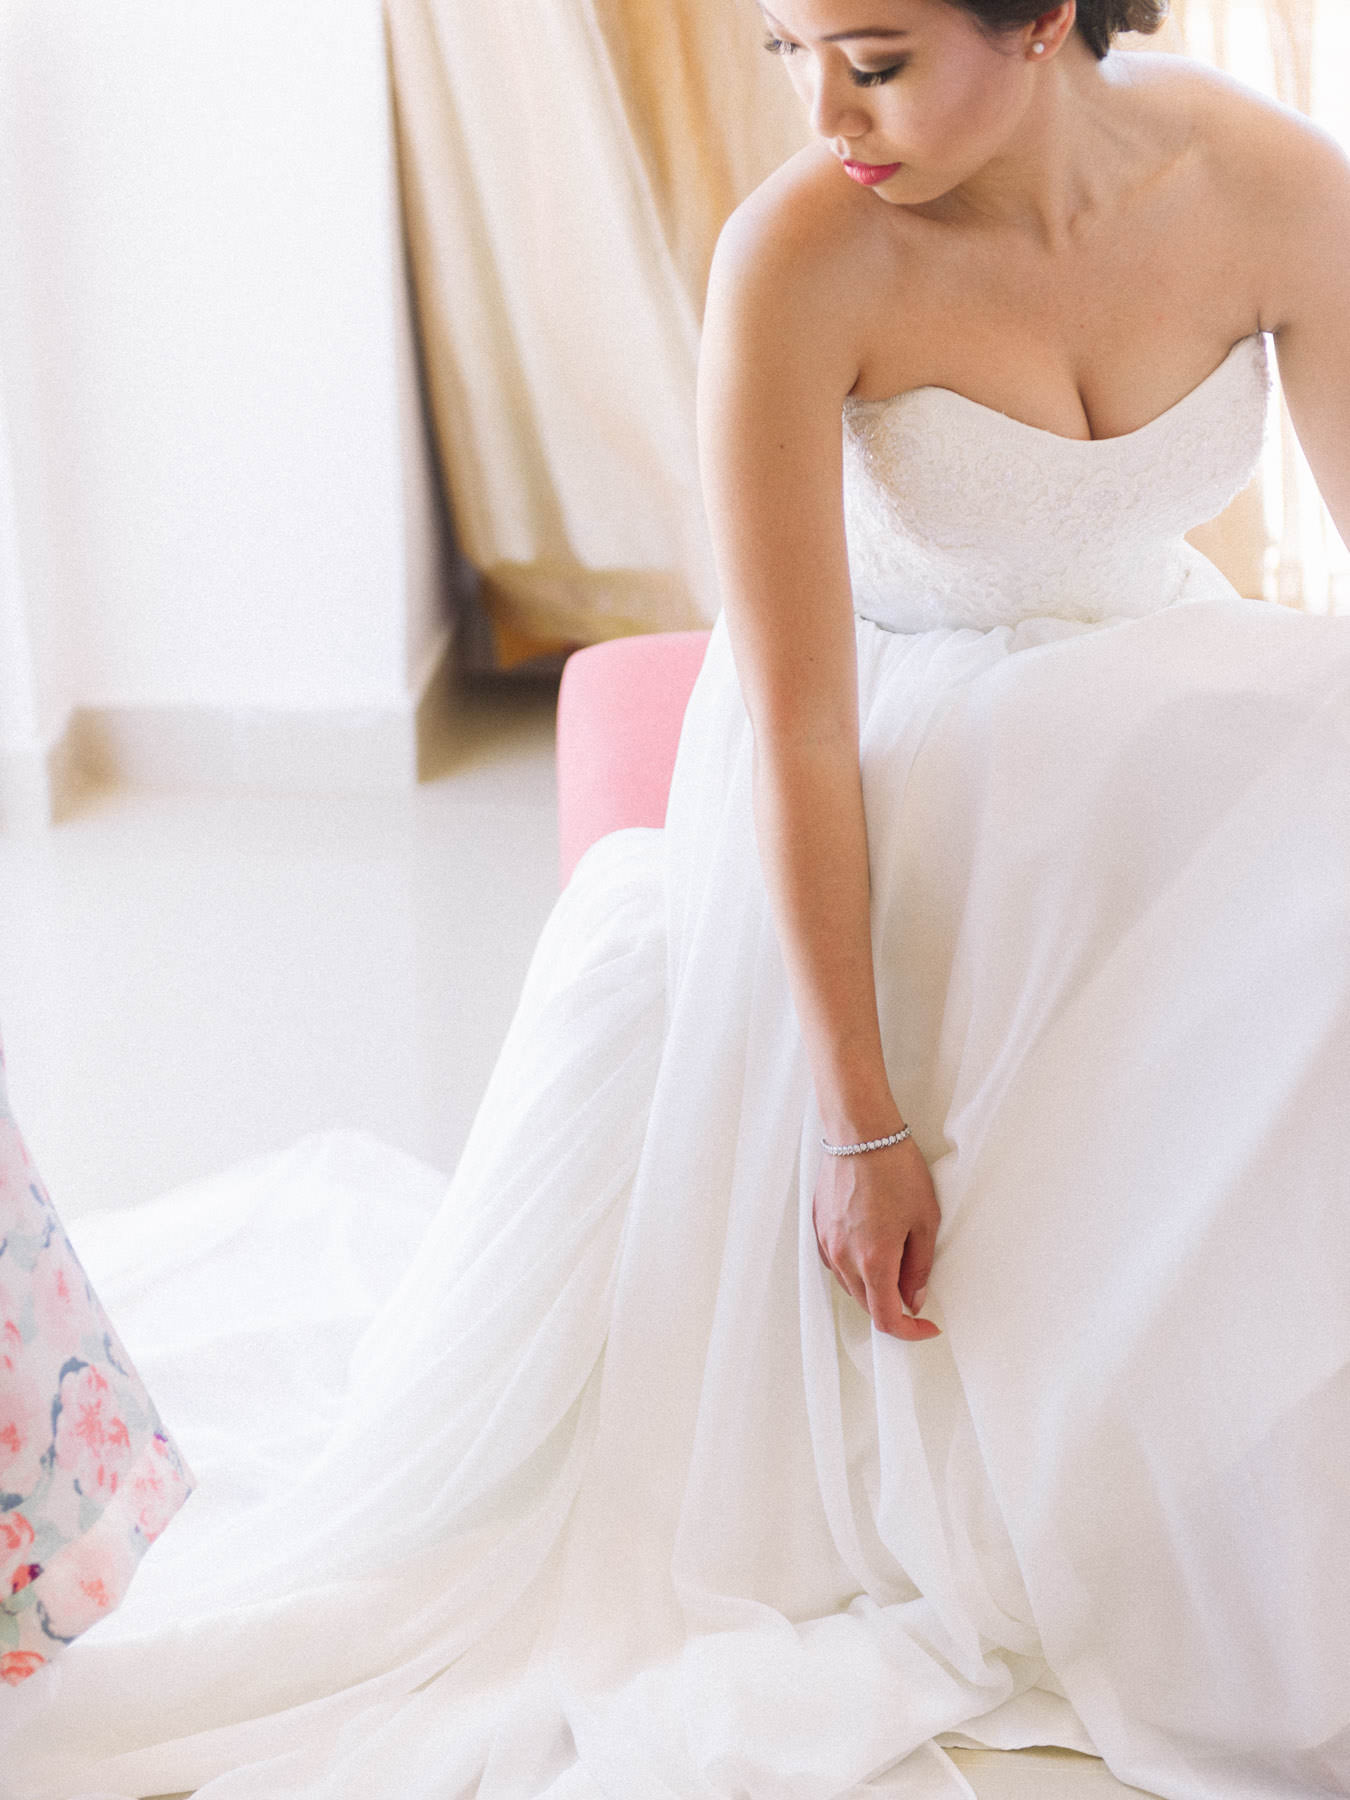 Varadero Cuba destination wedding photographer